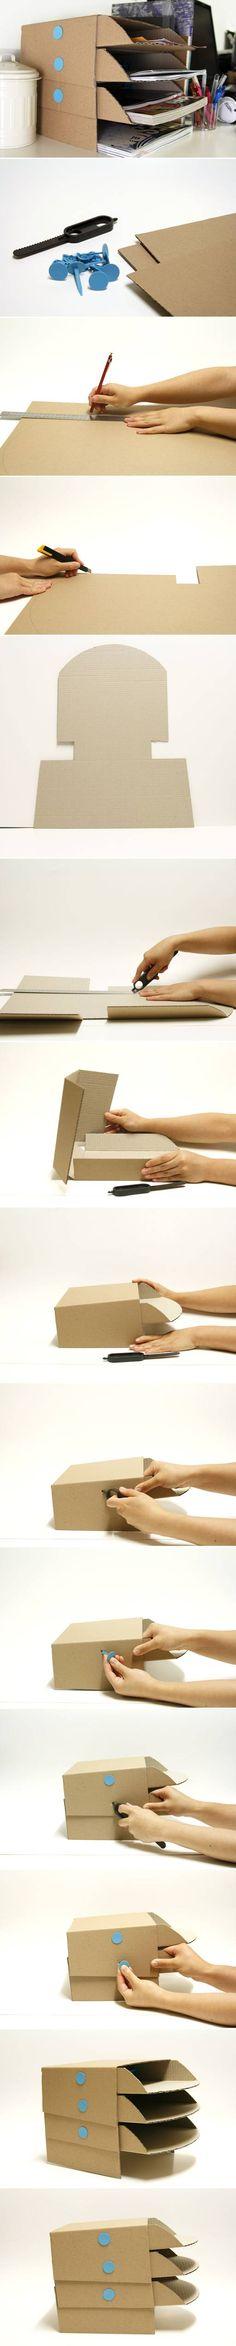 DIY Cardboard Desk Tray 160 best Cardboard